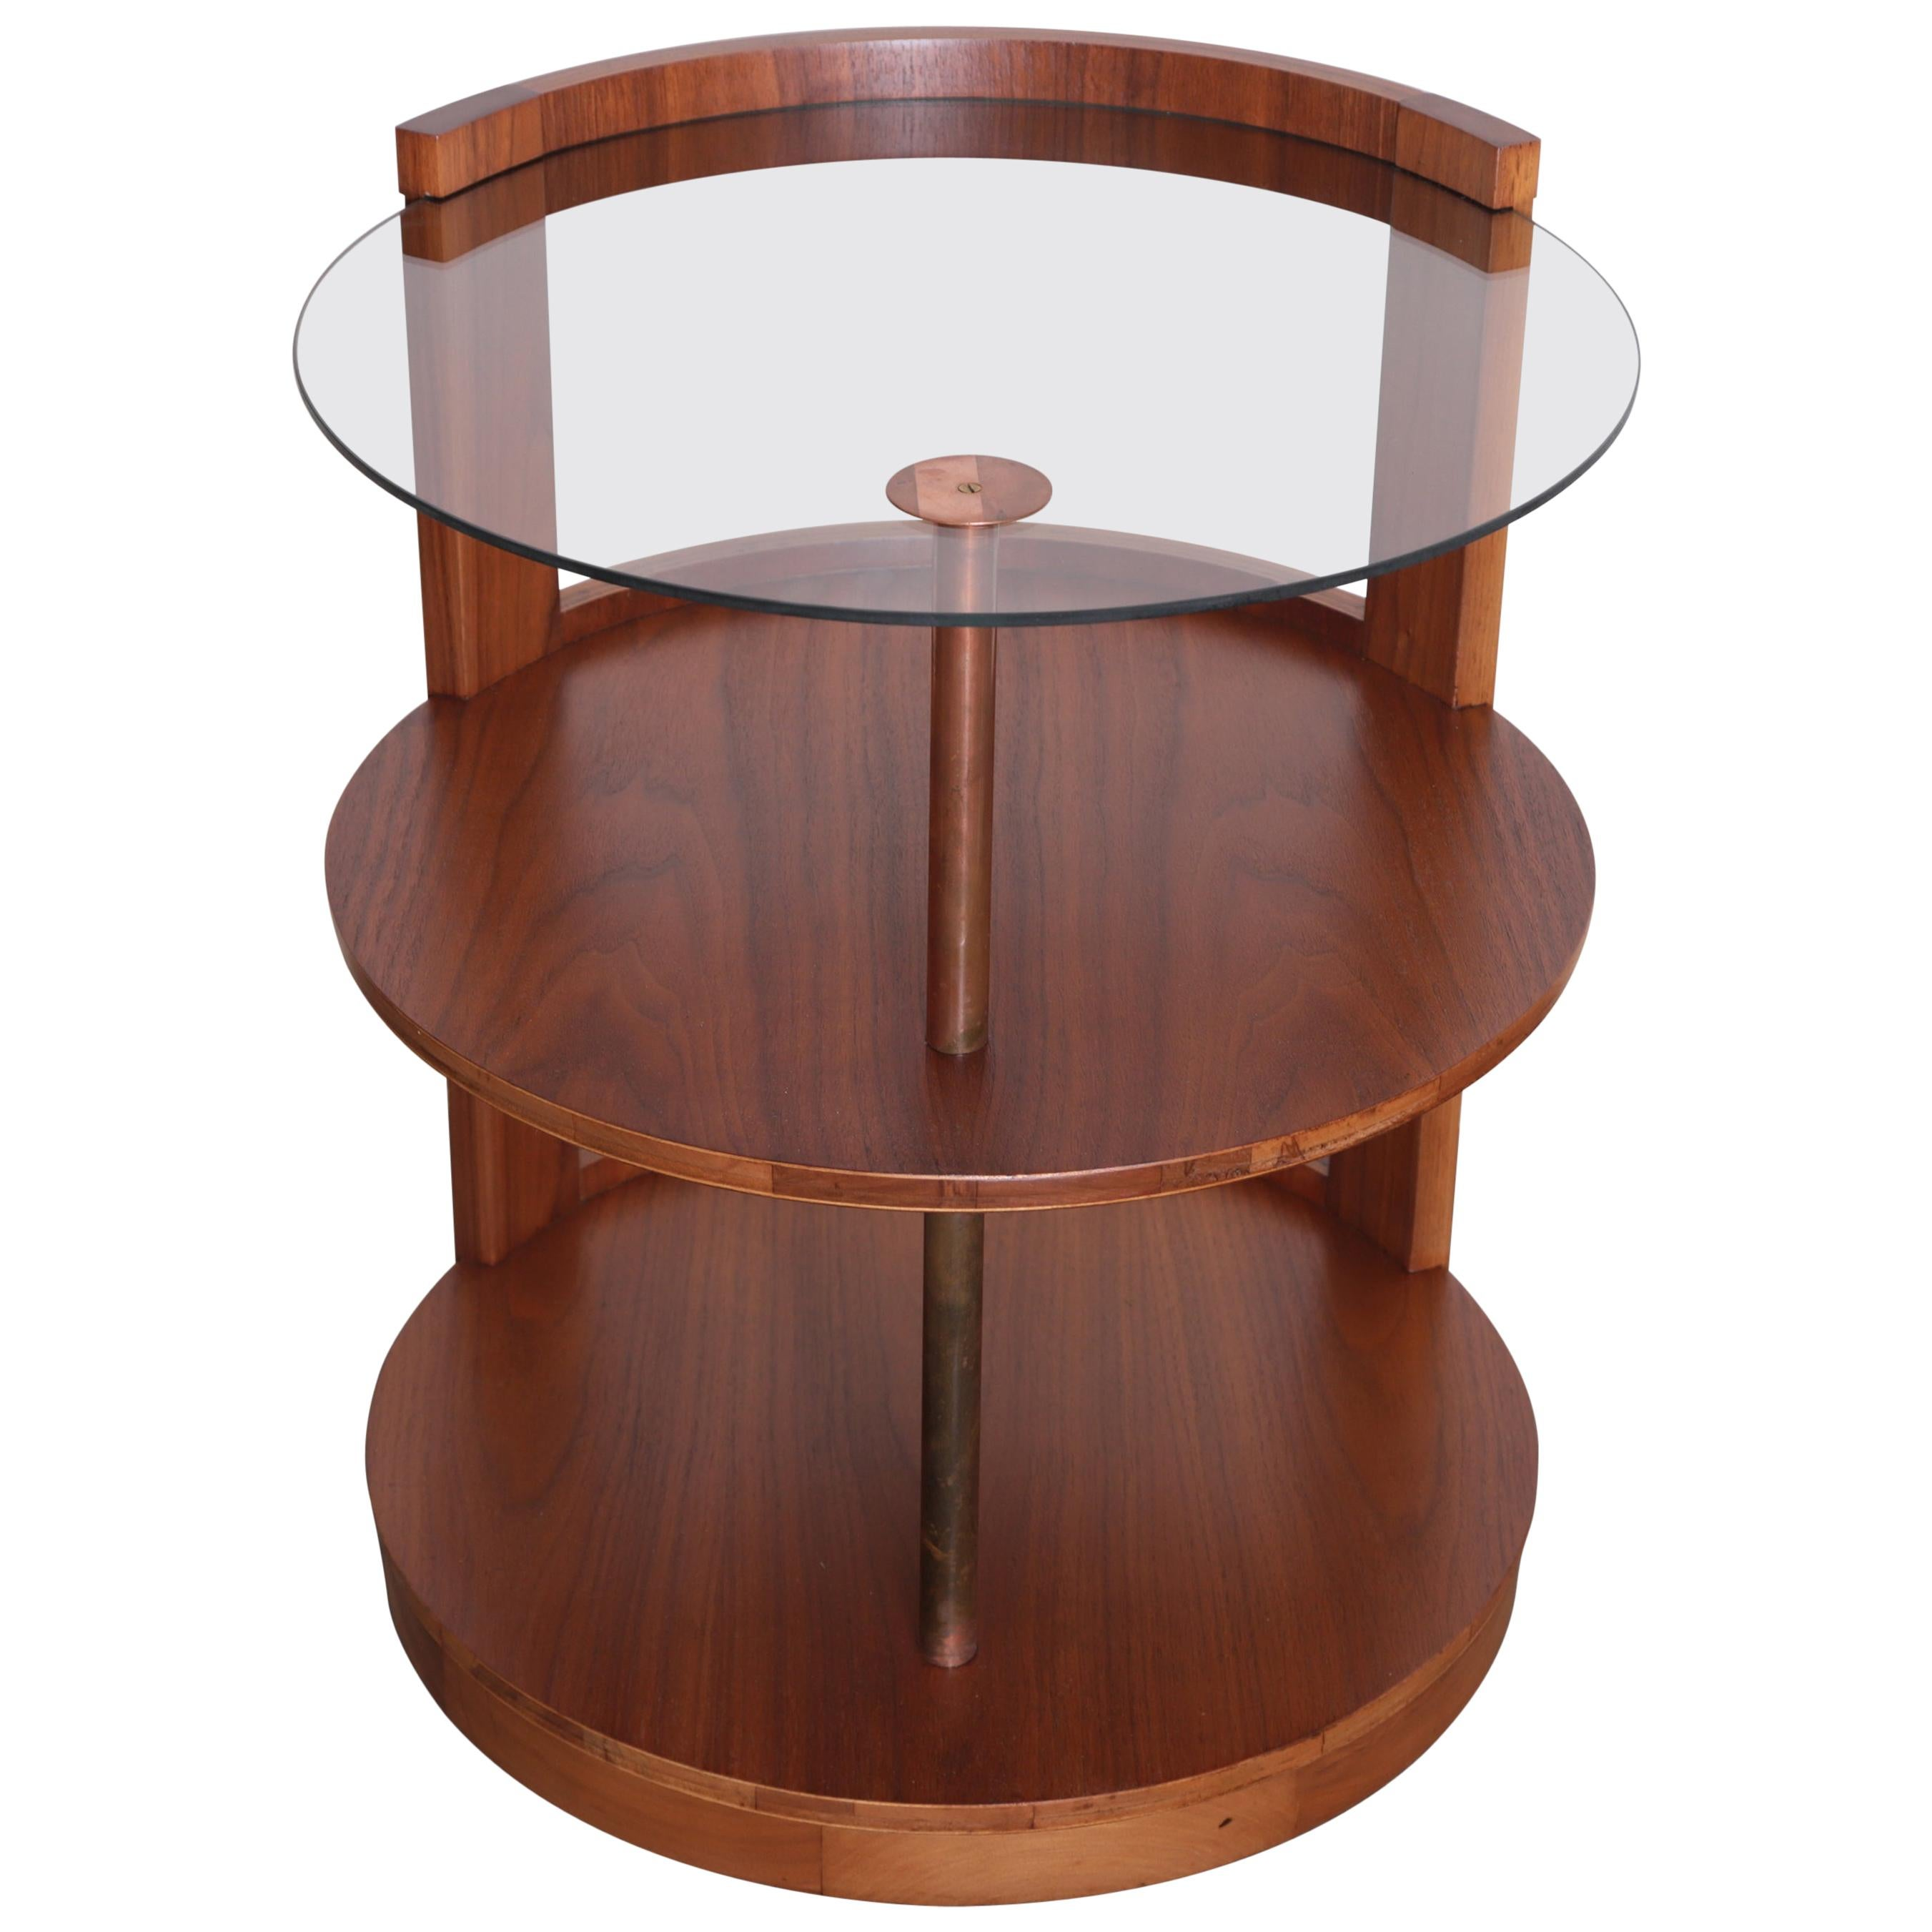 Machine Age Art Deco Streamline Gilbert Rohde for Kroehler Cocktail Table